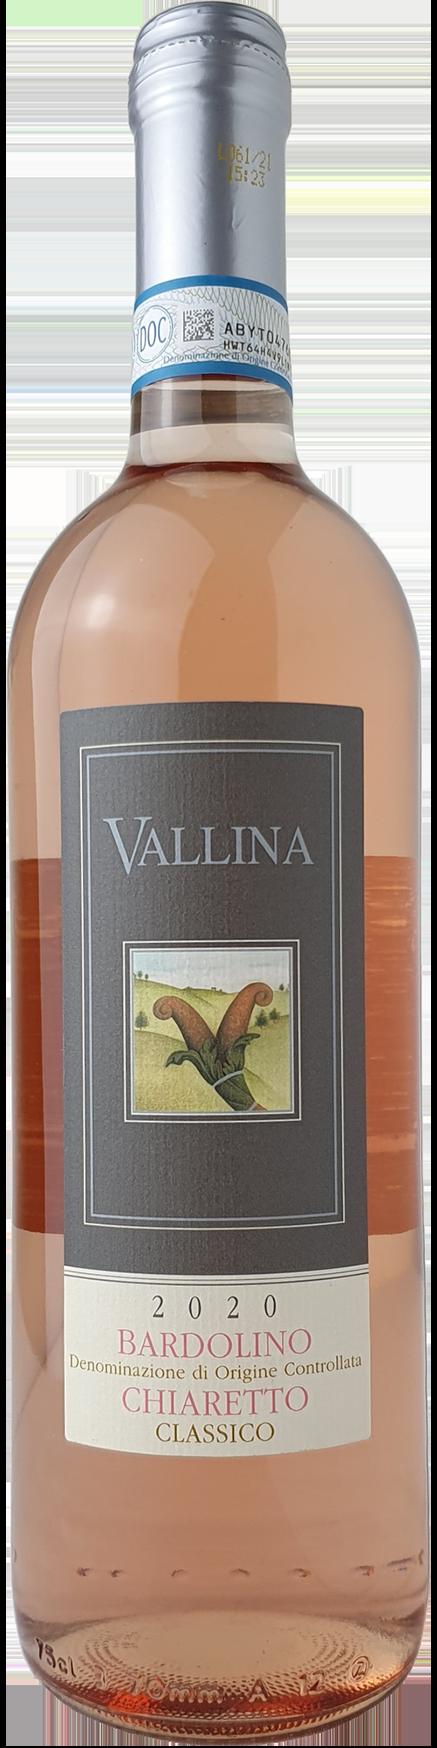 2019 Vallina Bardolino Chiaretto